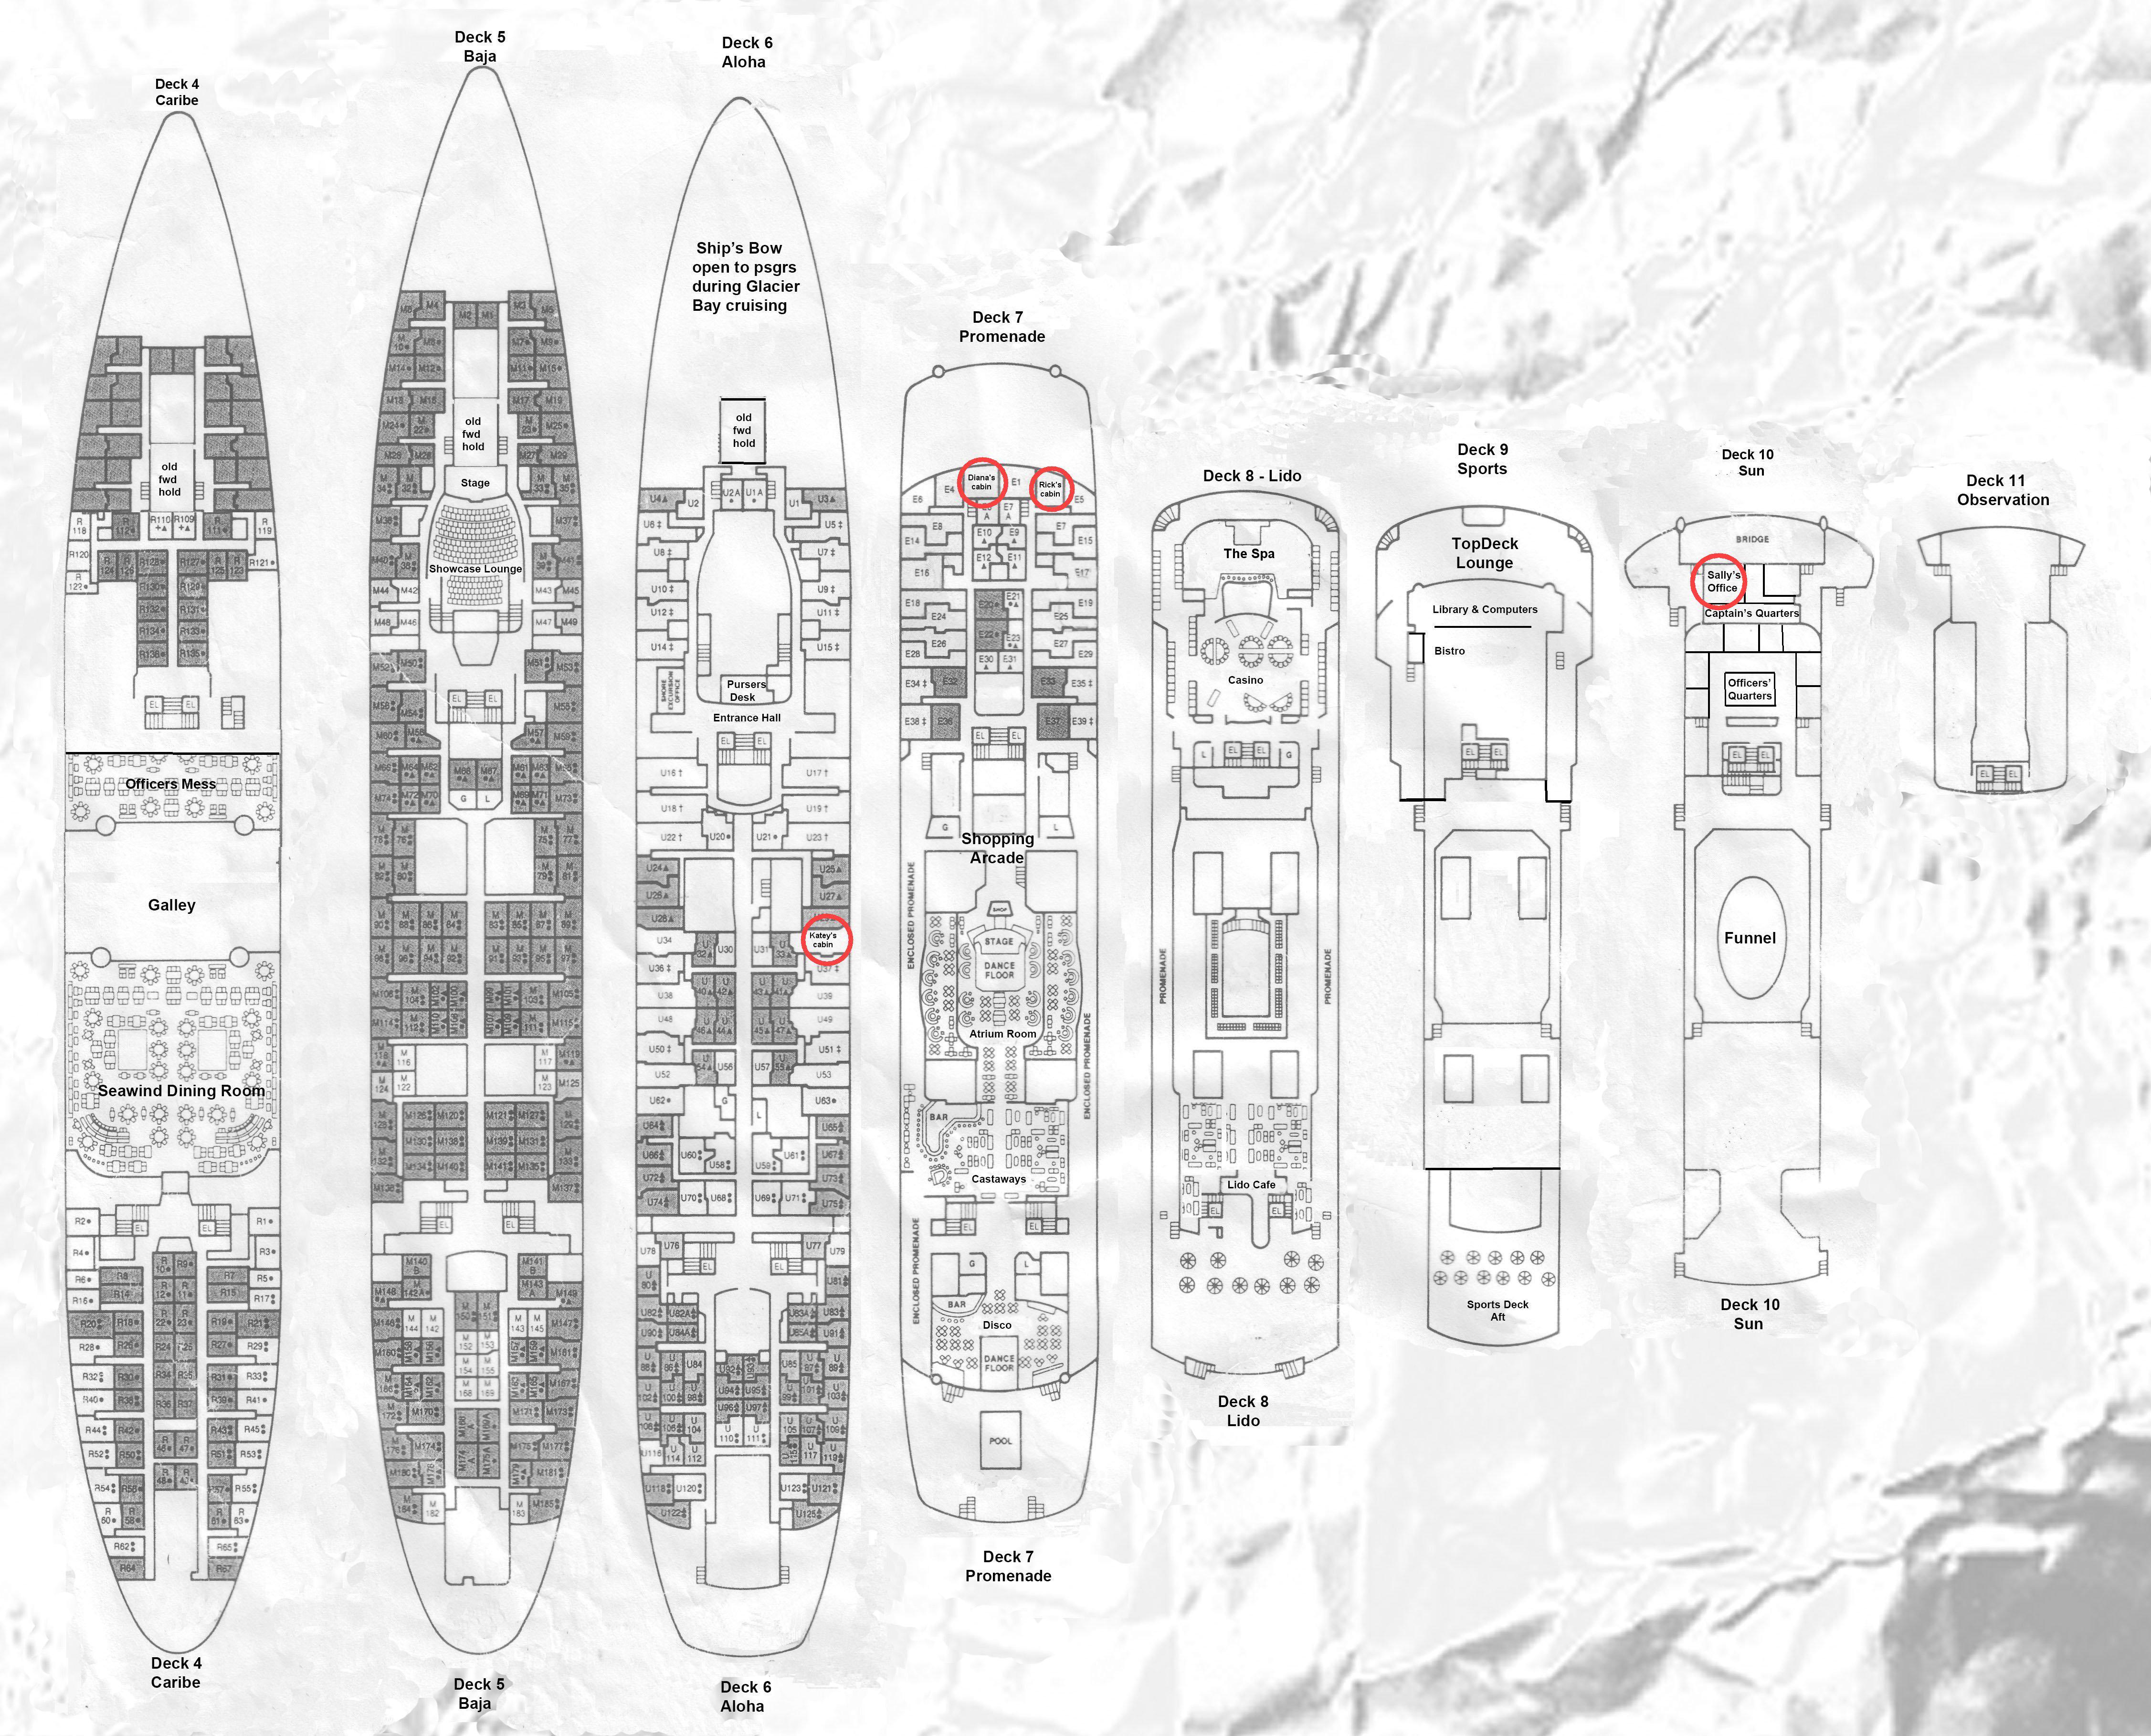 Deck Plans - Cruise ship floor plans